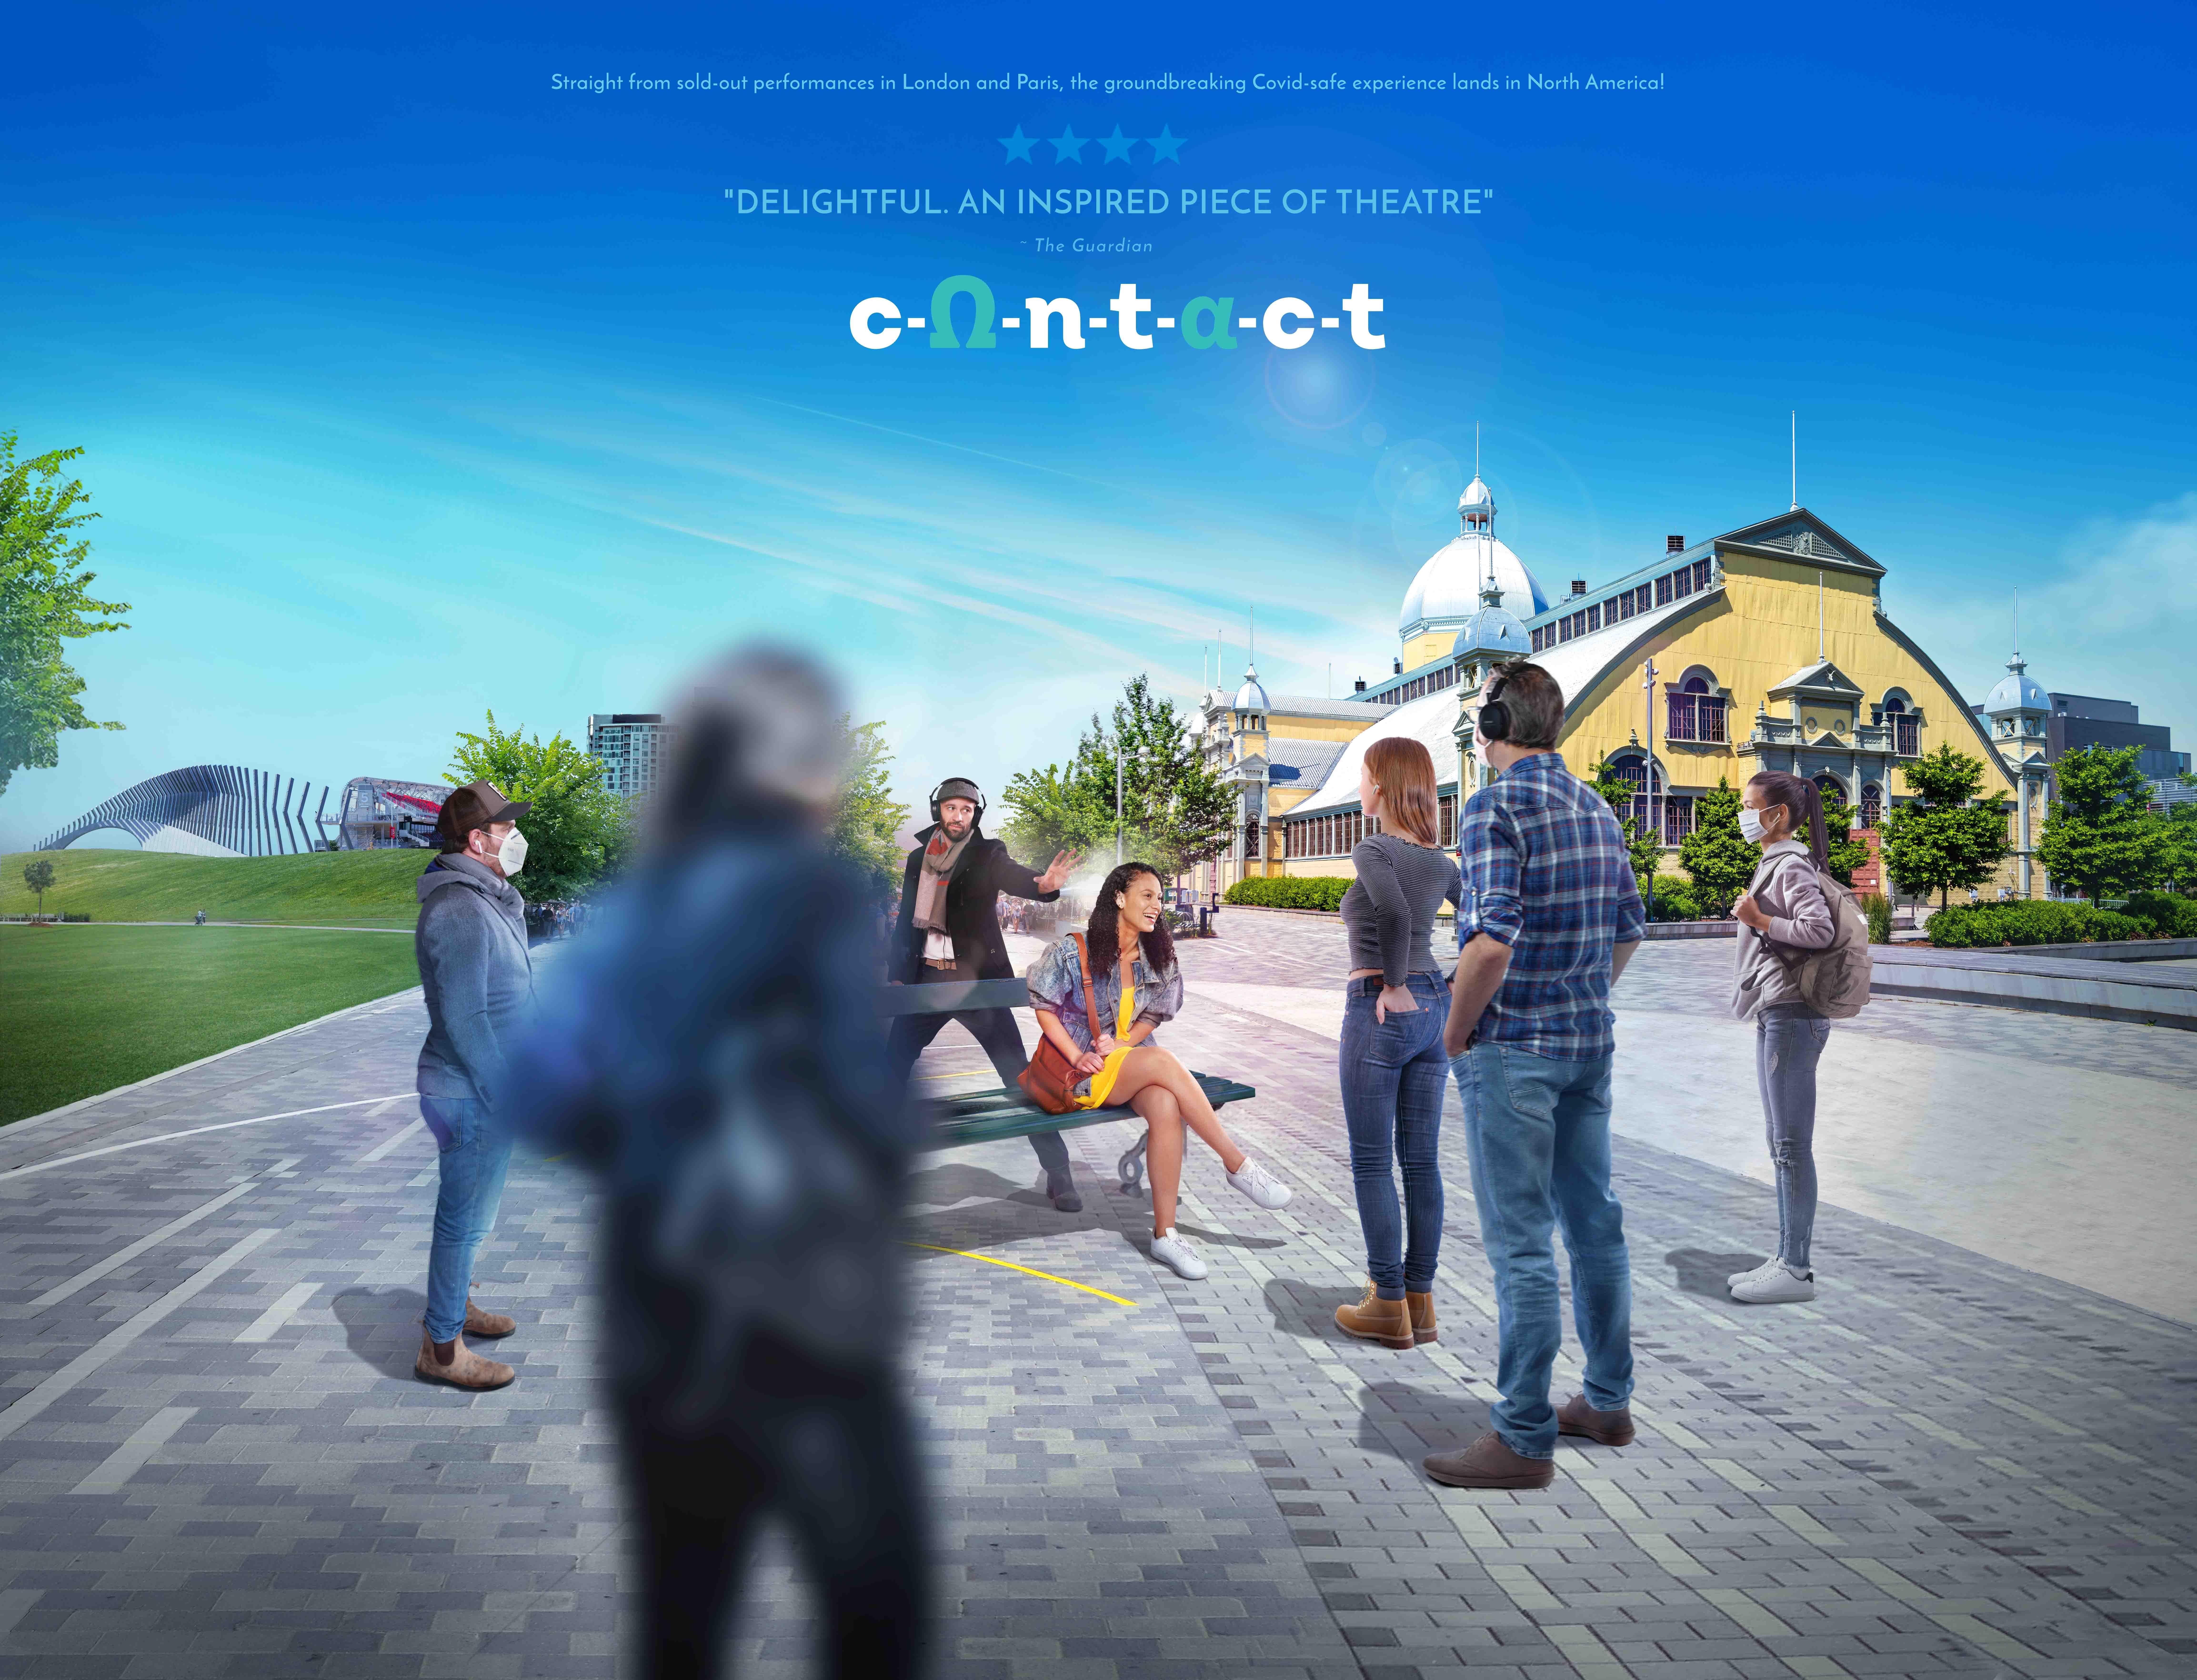 C-O-N-T-A-C-T set to bring in-person theatre back to life in Ottawa